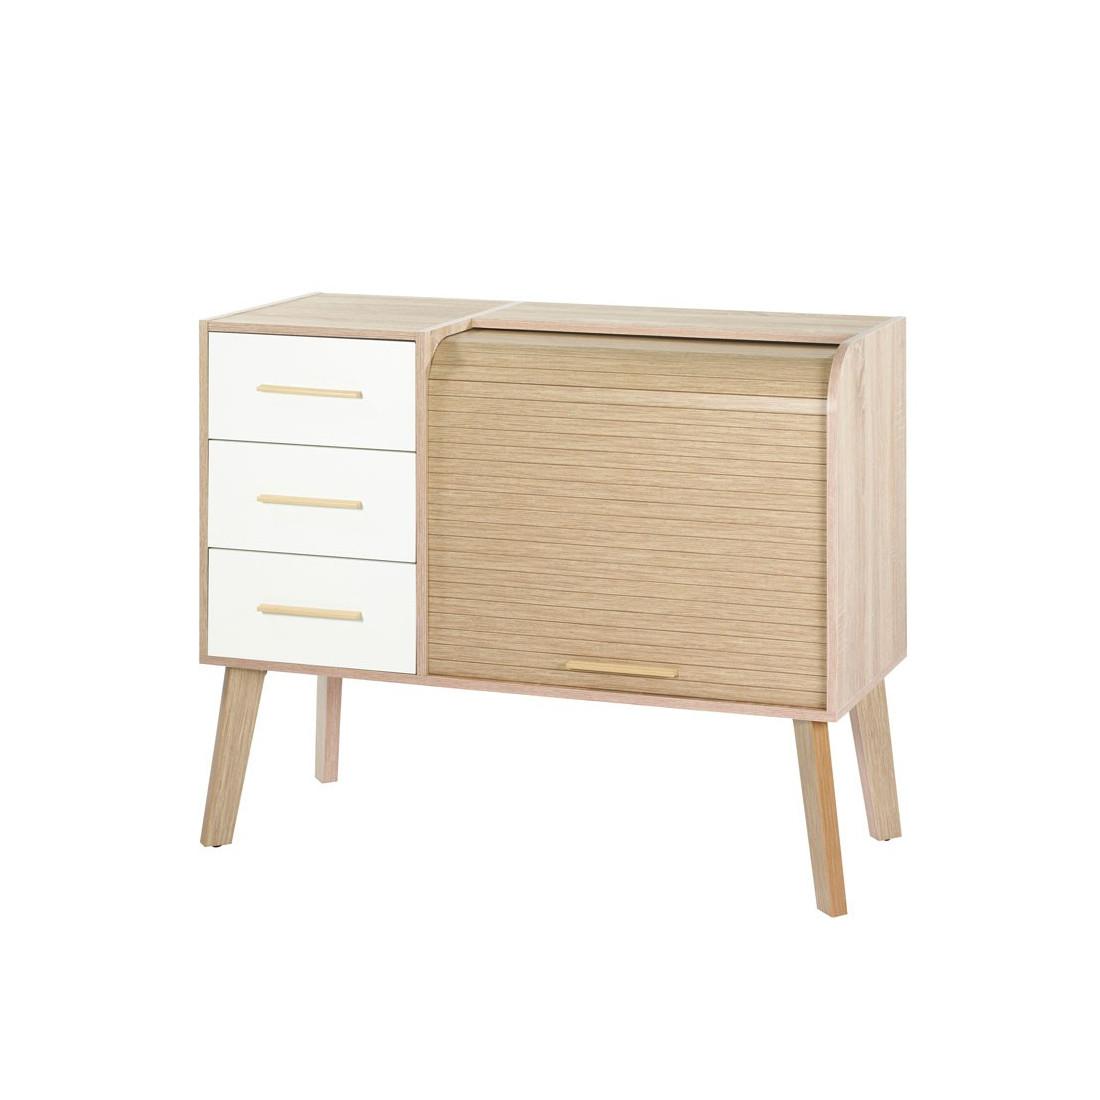 meuble 7 tiroirs - meuble d 39 entr e rideau 3 tiroirs arkos n 7 univers petits meubles